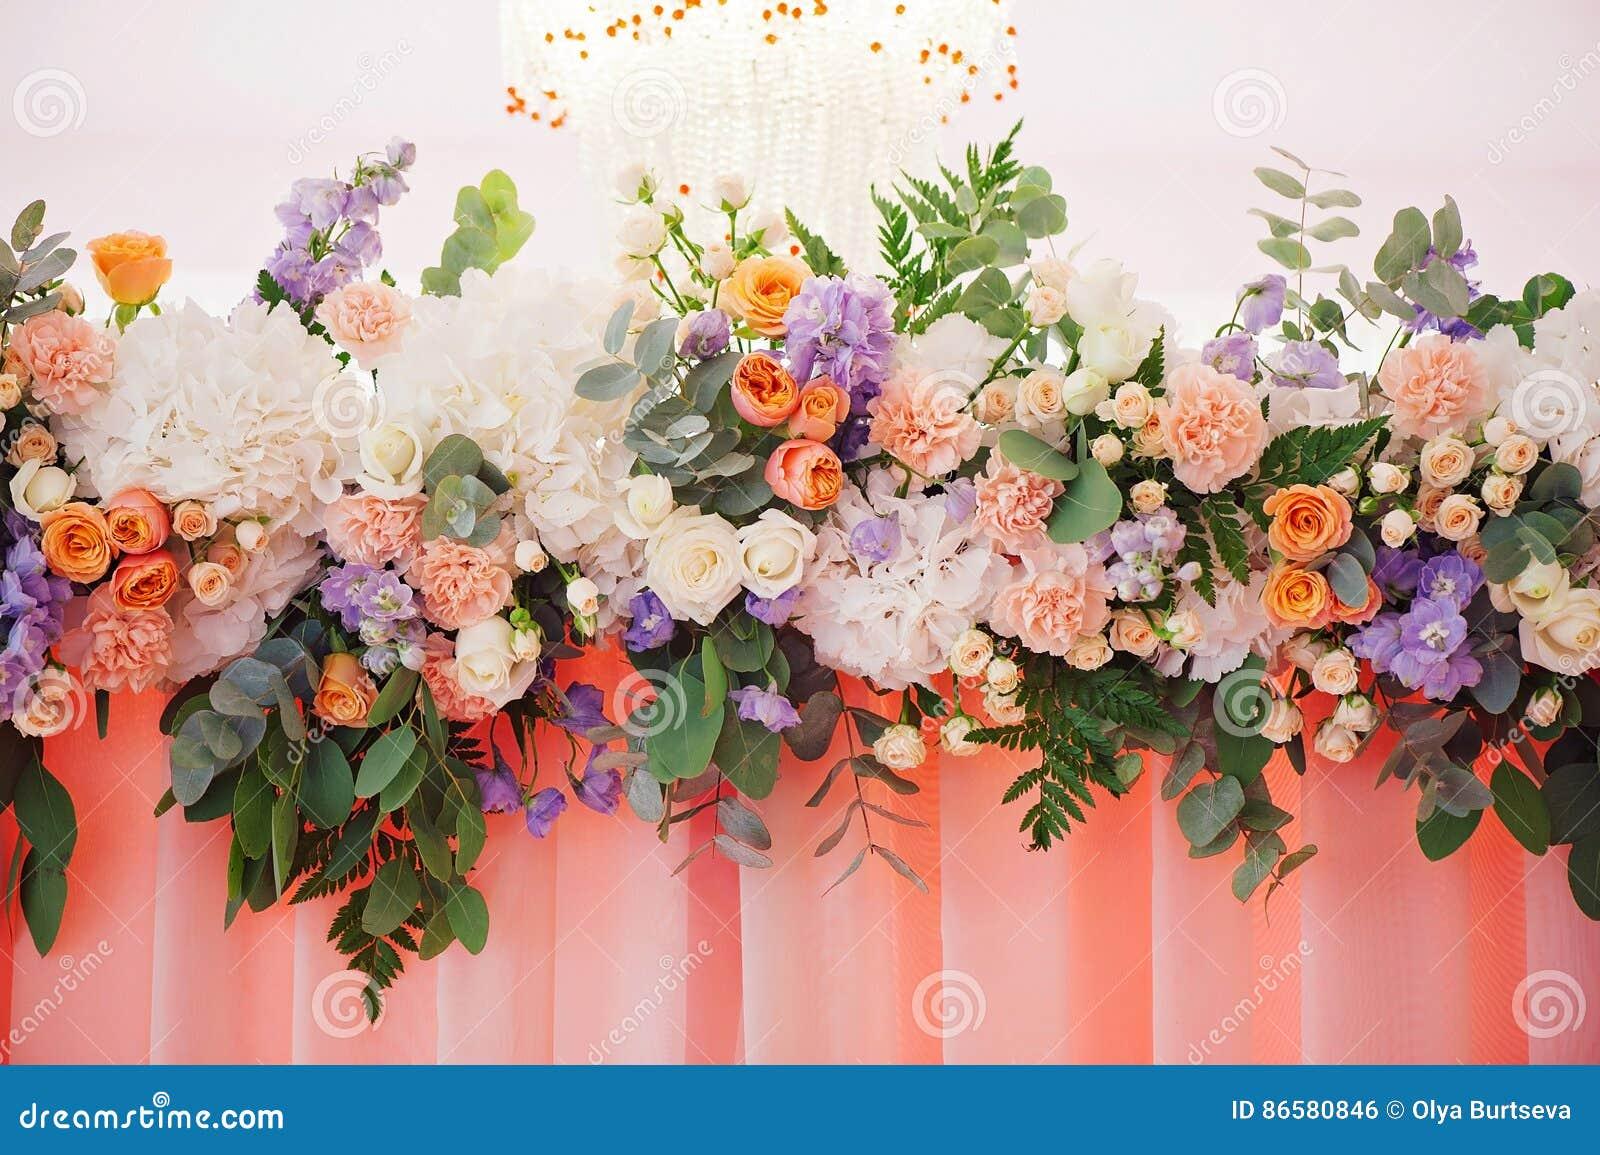 wedding decorating bouquet of roses and petals closeup stock photo